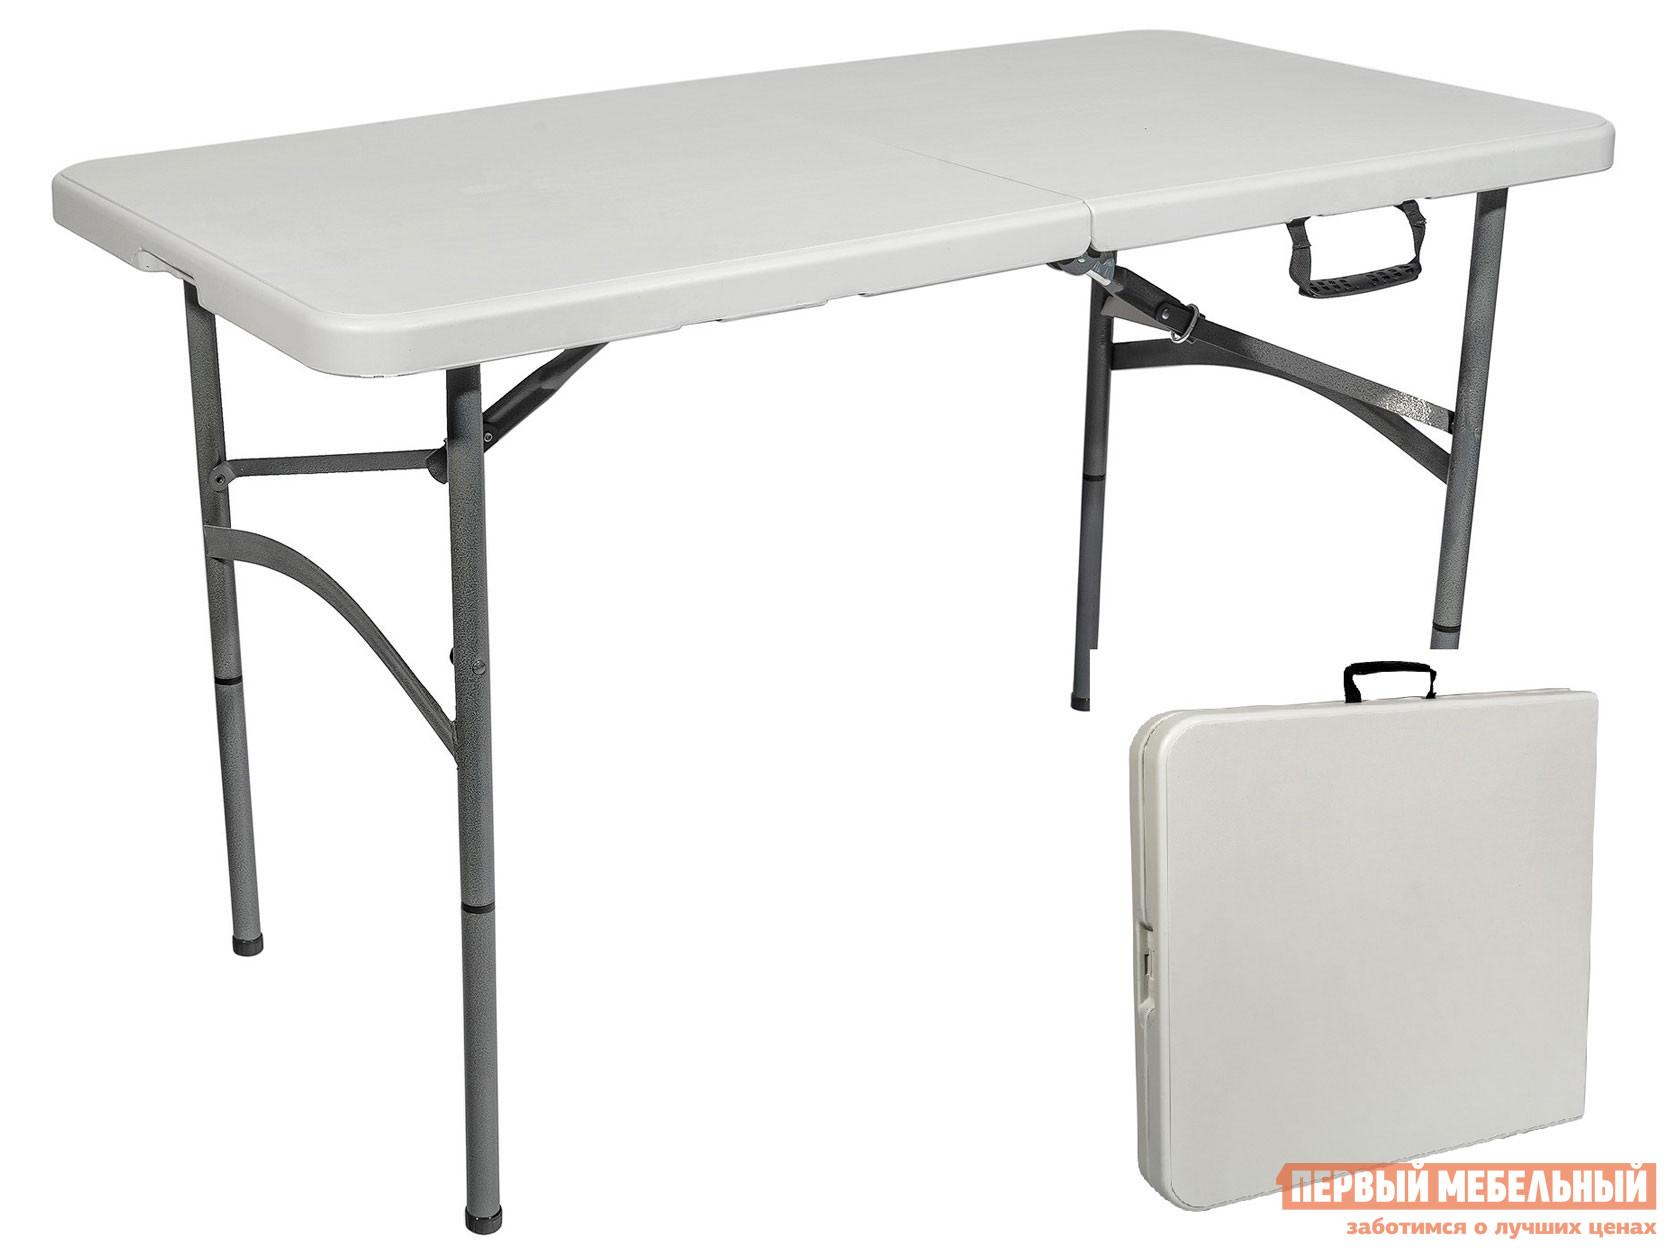 Стол для пикника  Стол складной-чемодан NEW Серый, пластик